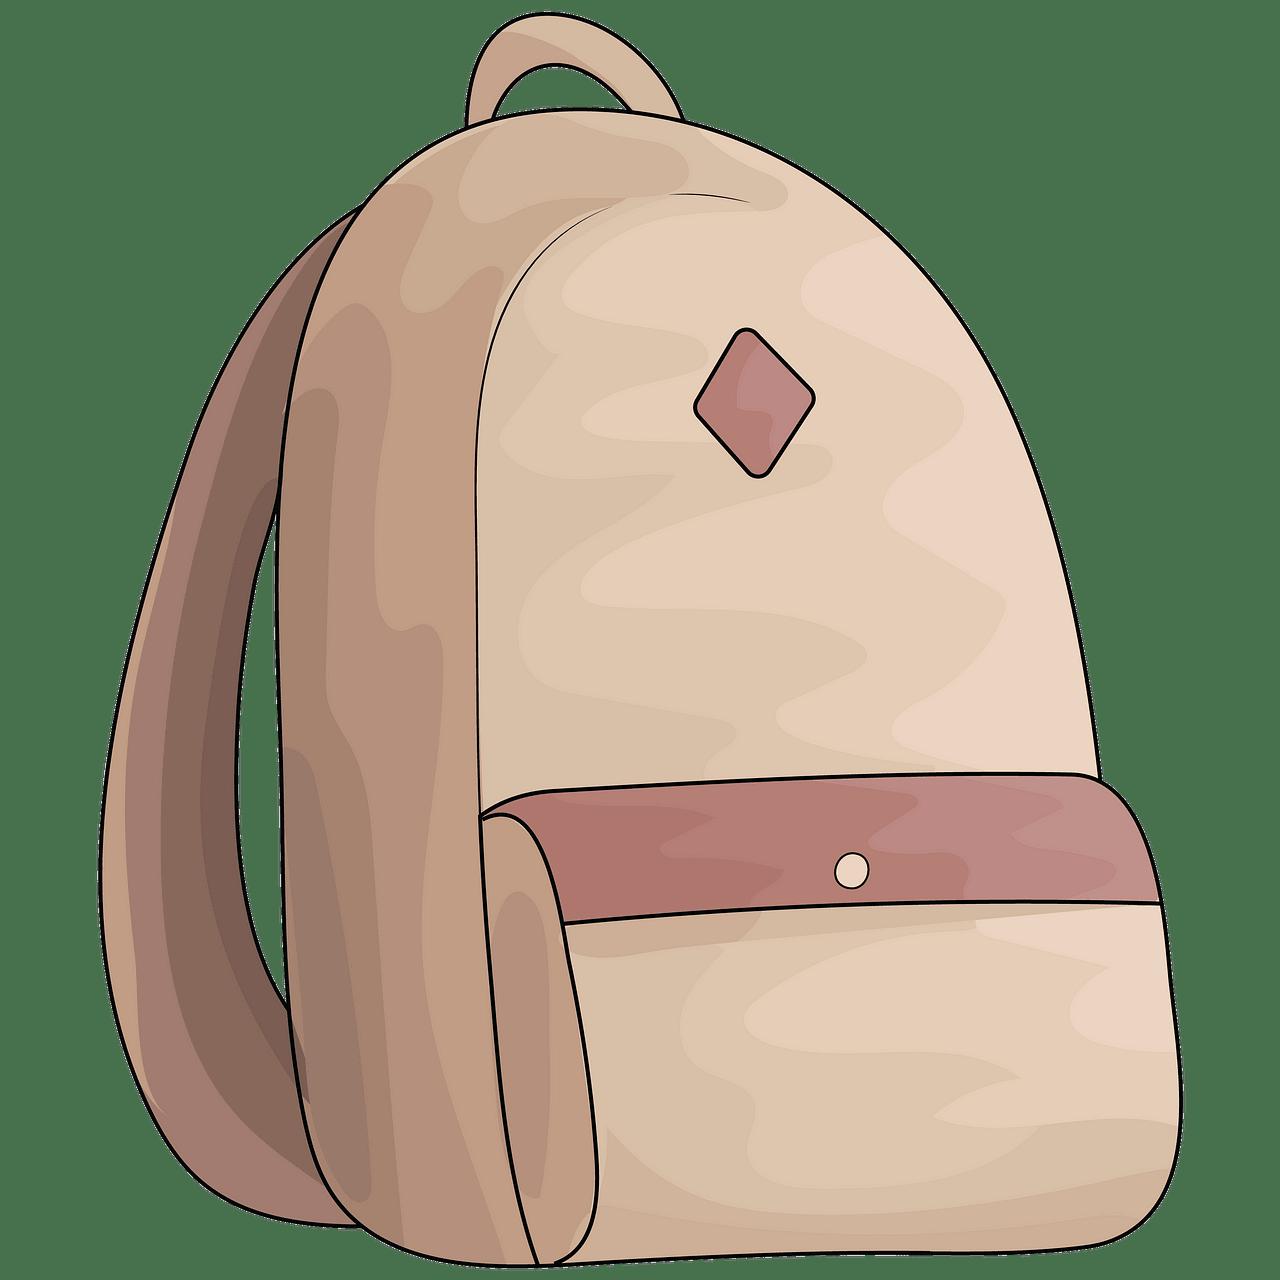 School bag clipart. Free download..